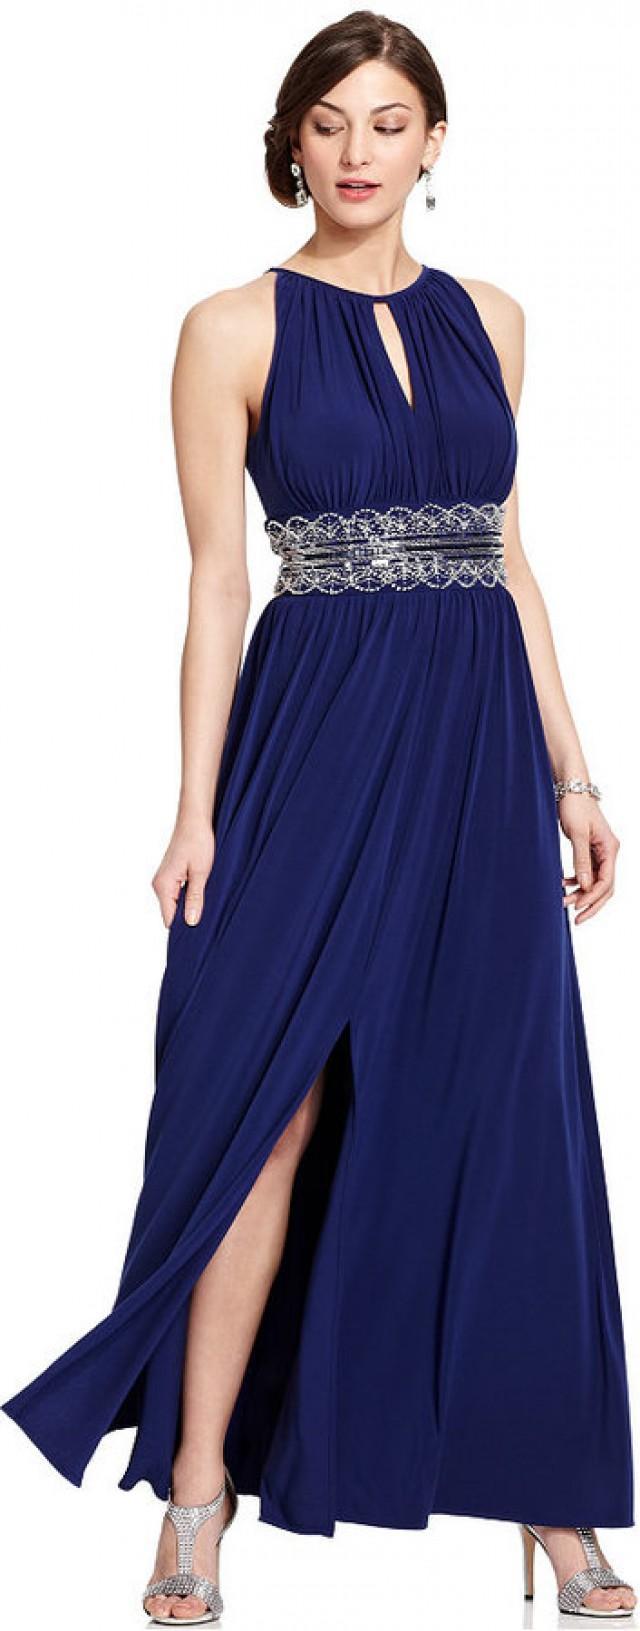 R&M Richards Sleeveless Beaded Evening Gown #2345615 - Weddbook